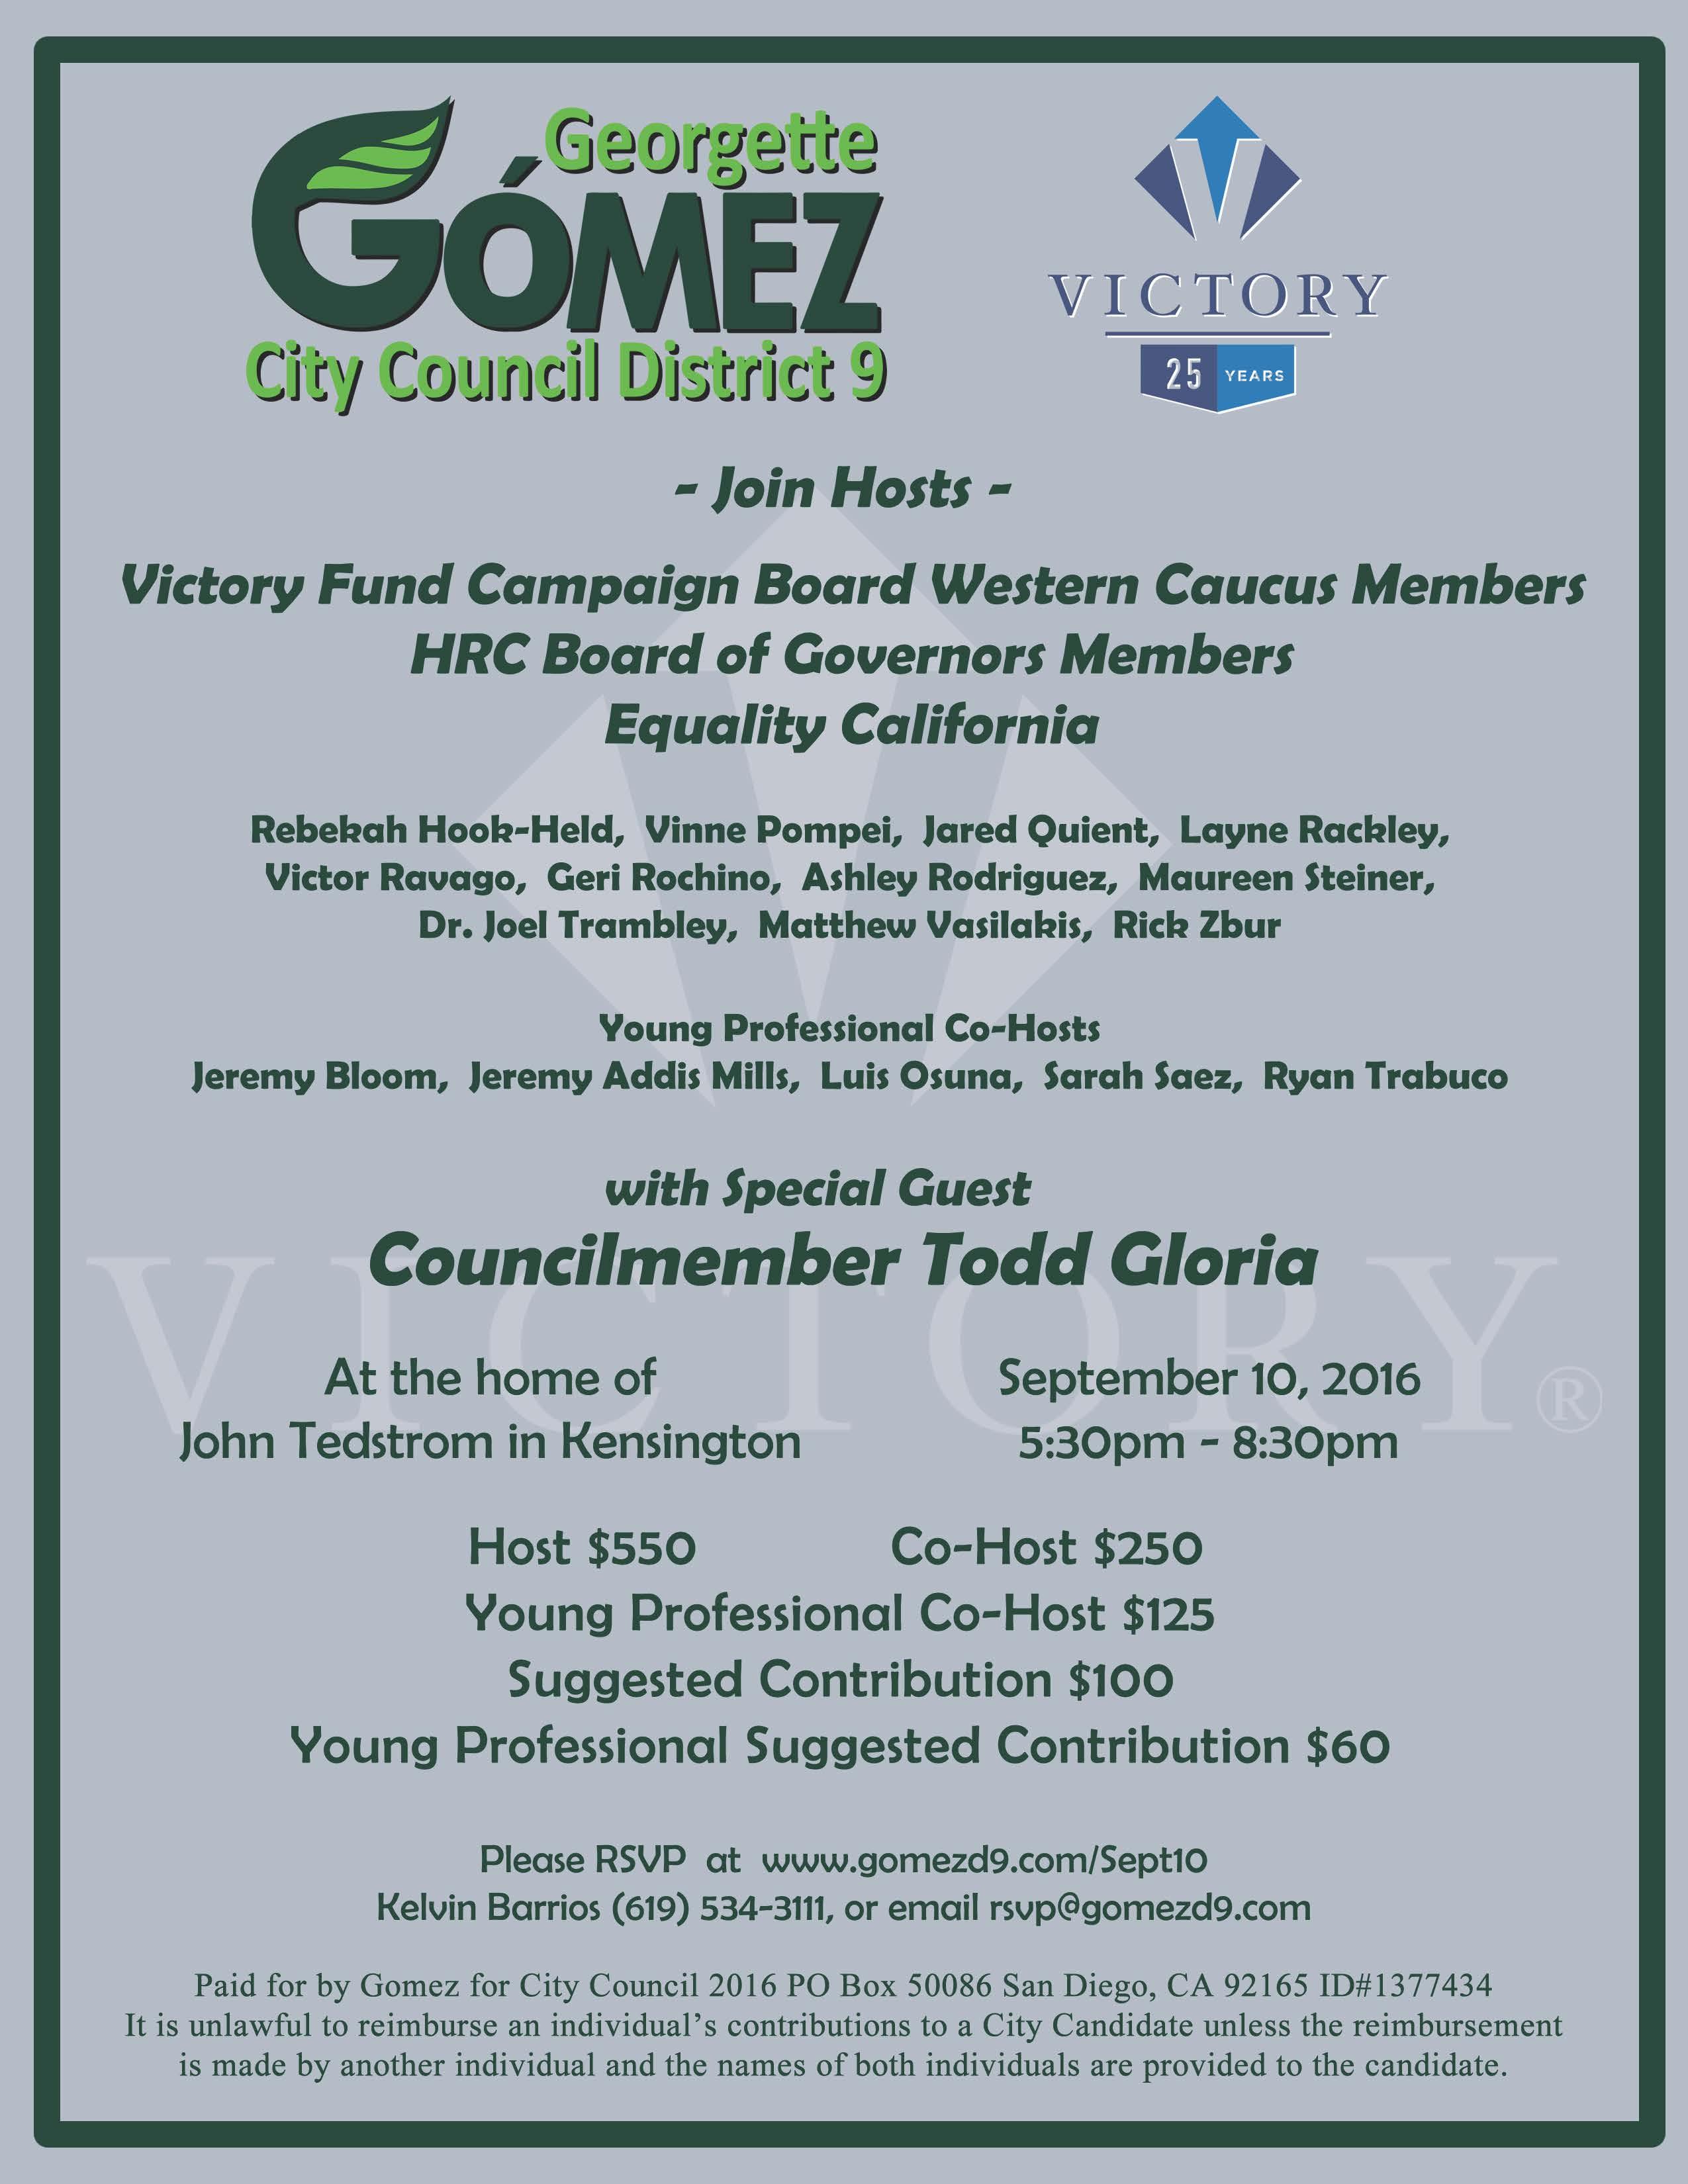 Victory_Fund_Fundraiser.jpg